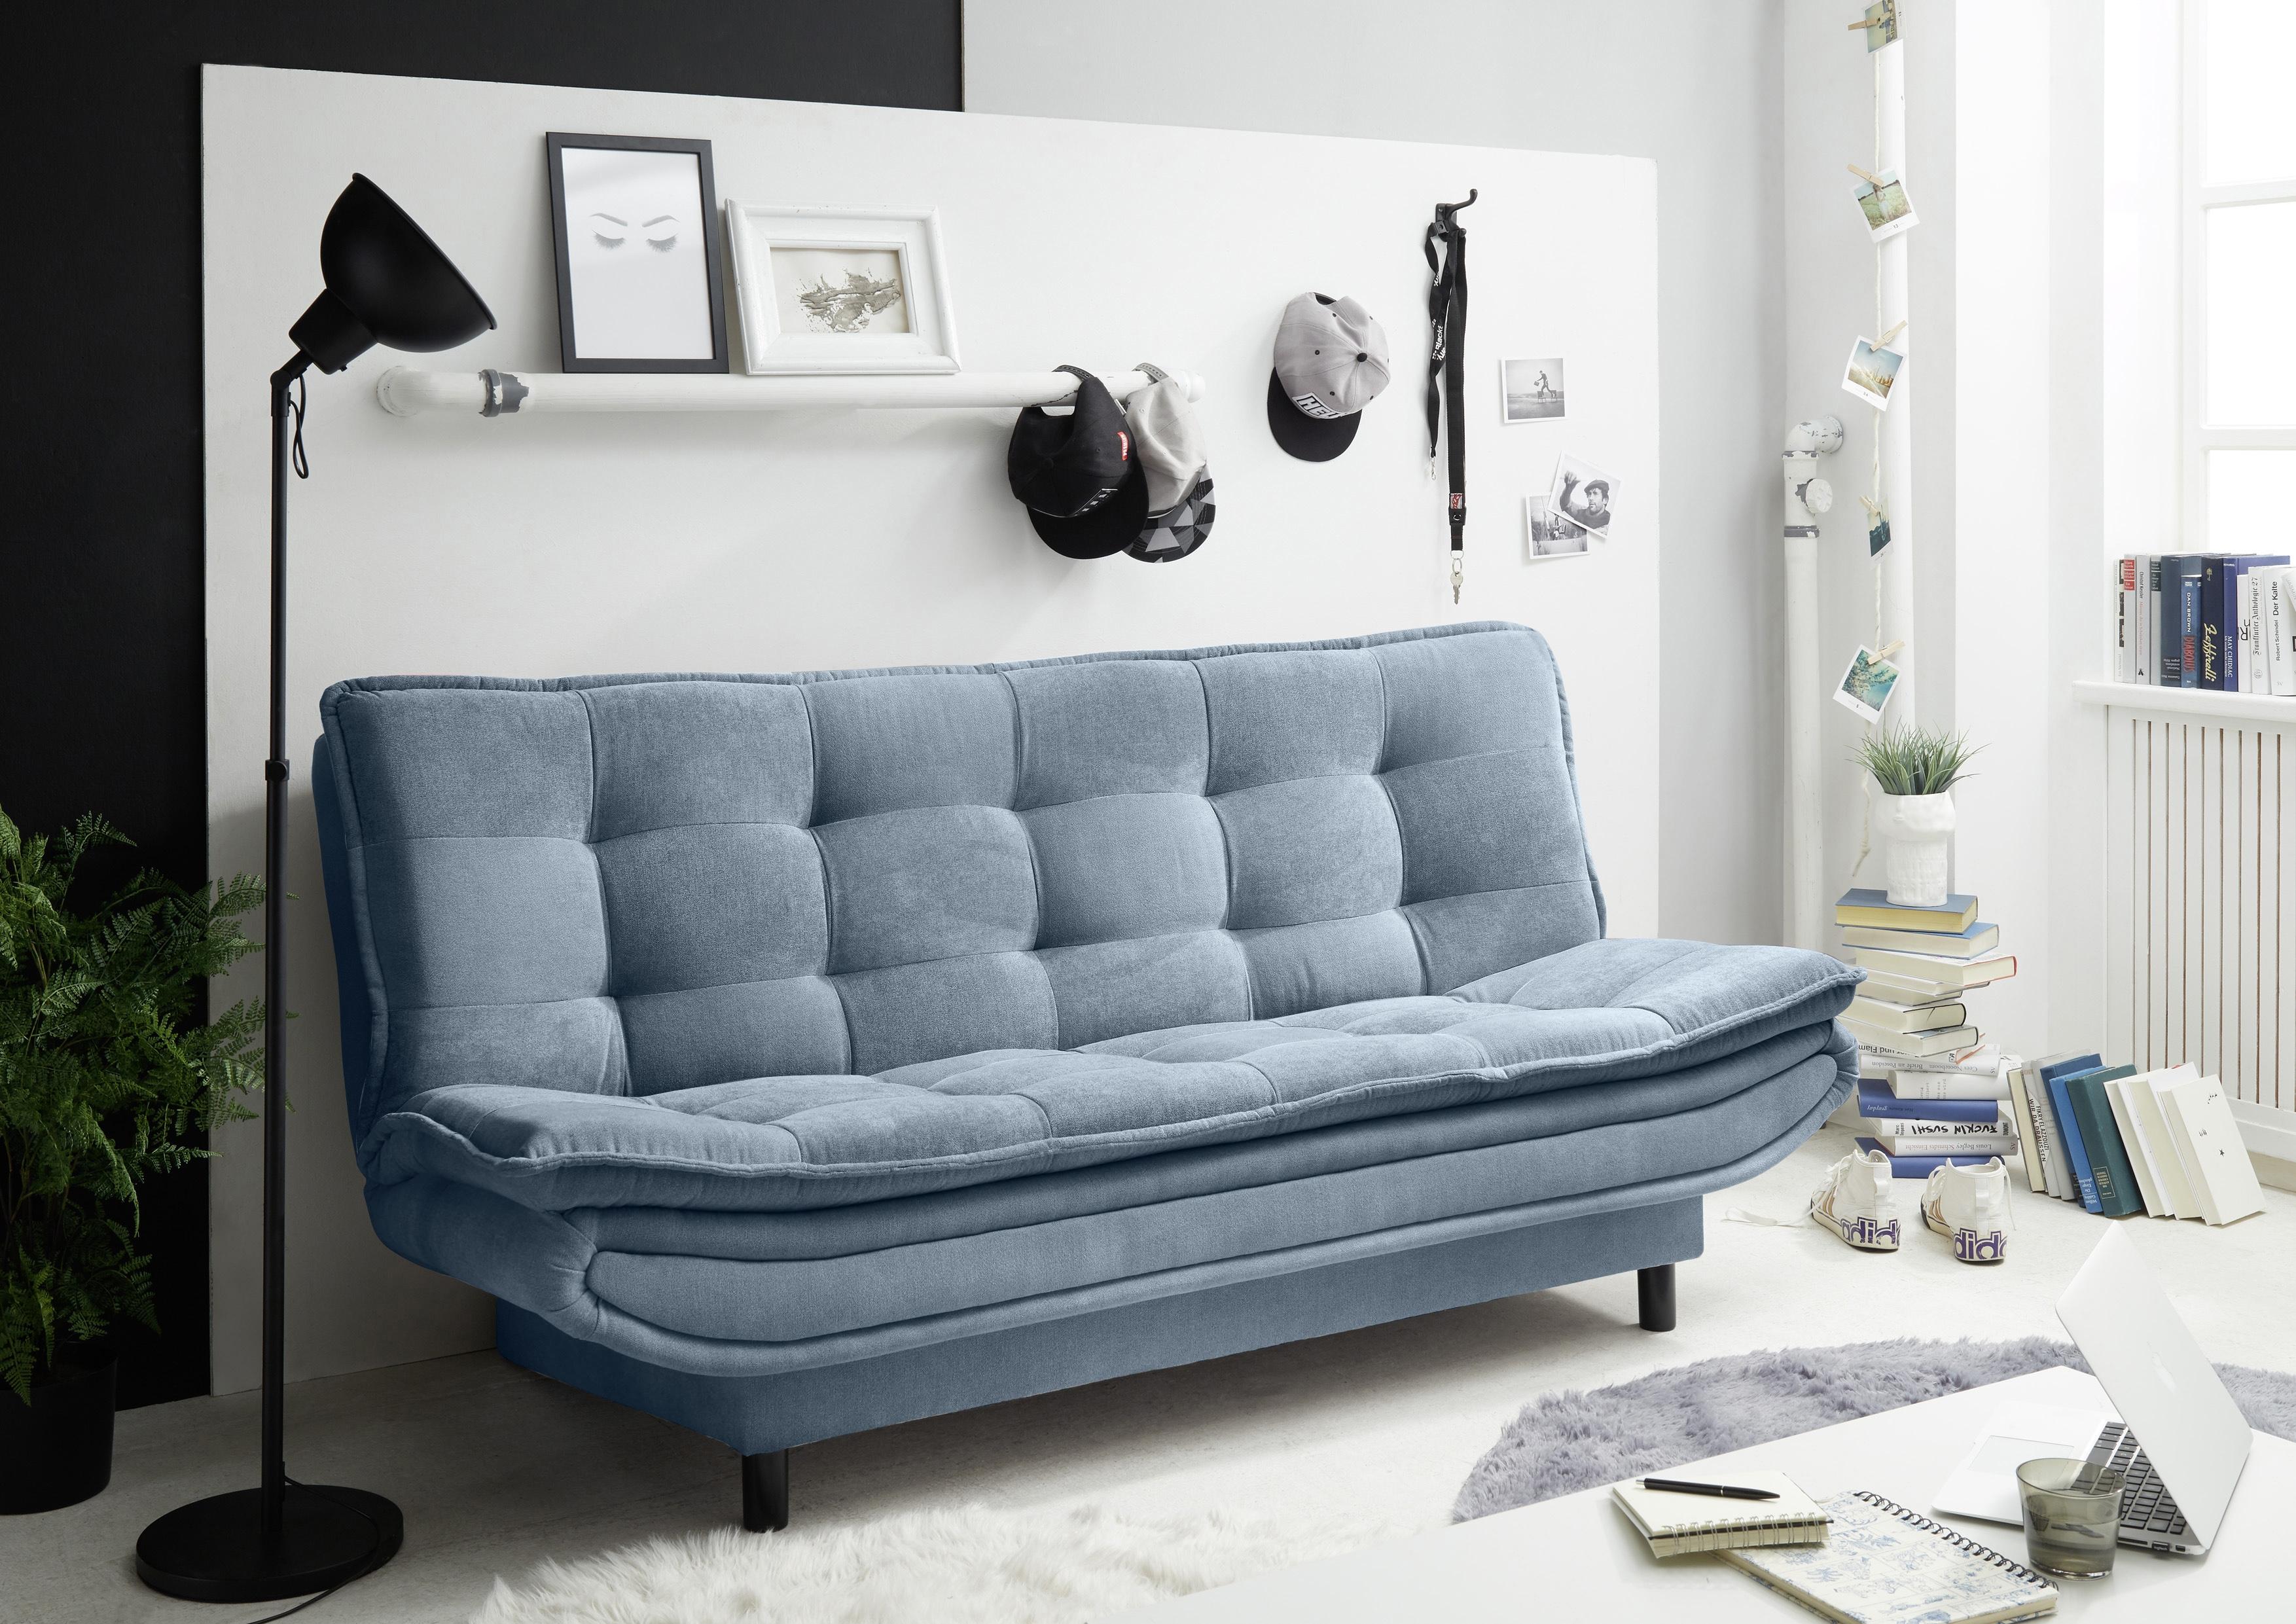 Canapea extensibila tapitata cu stofa, 3 locuri Patris Albastru, l188xA89xH90 cm imagine